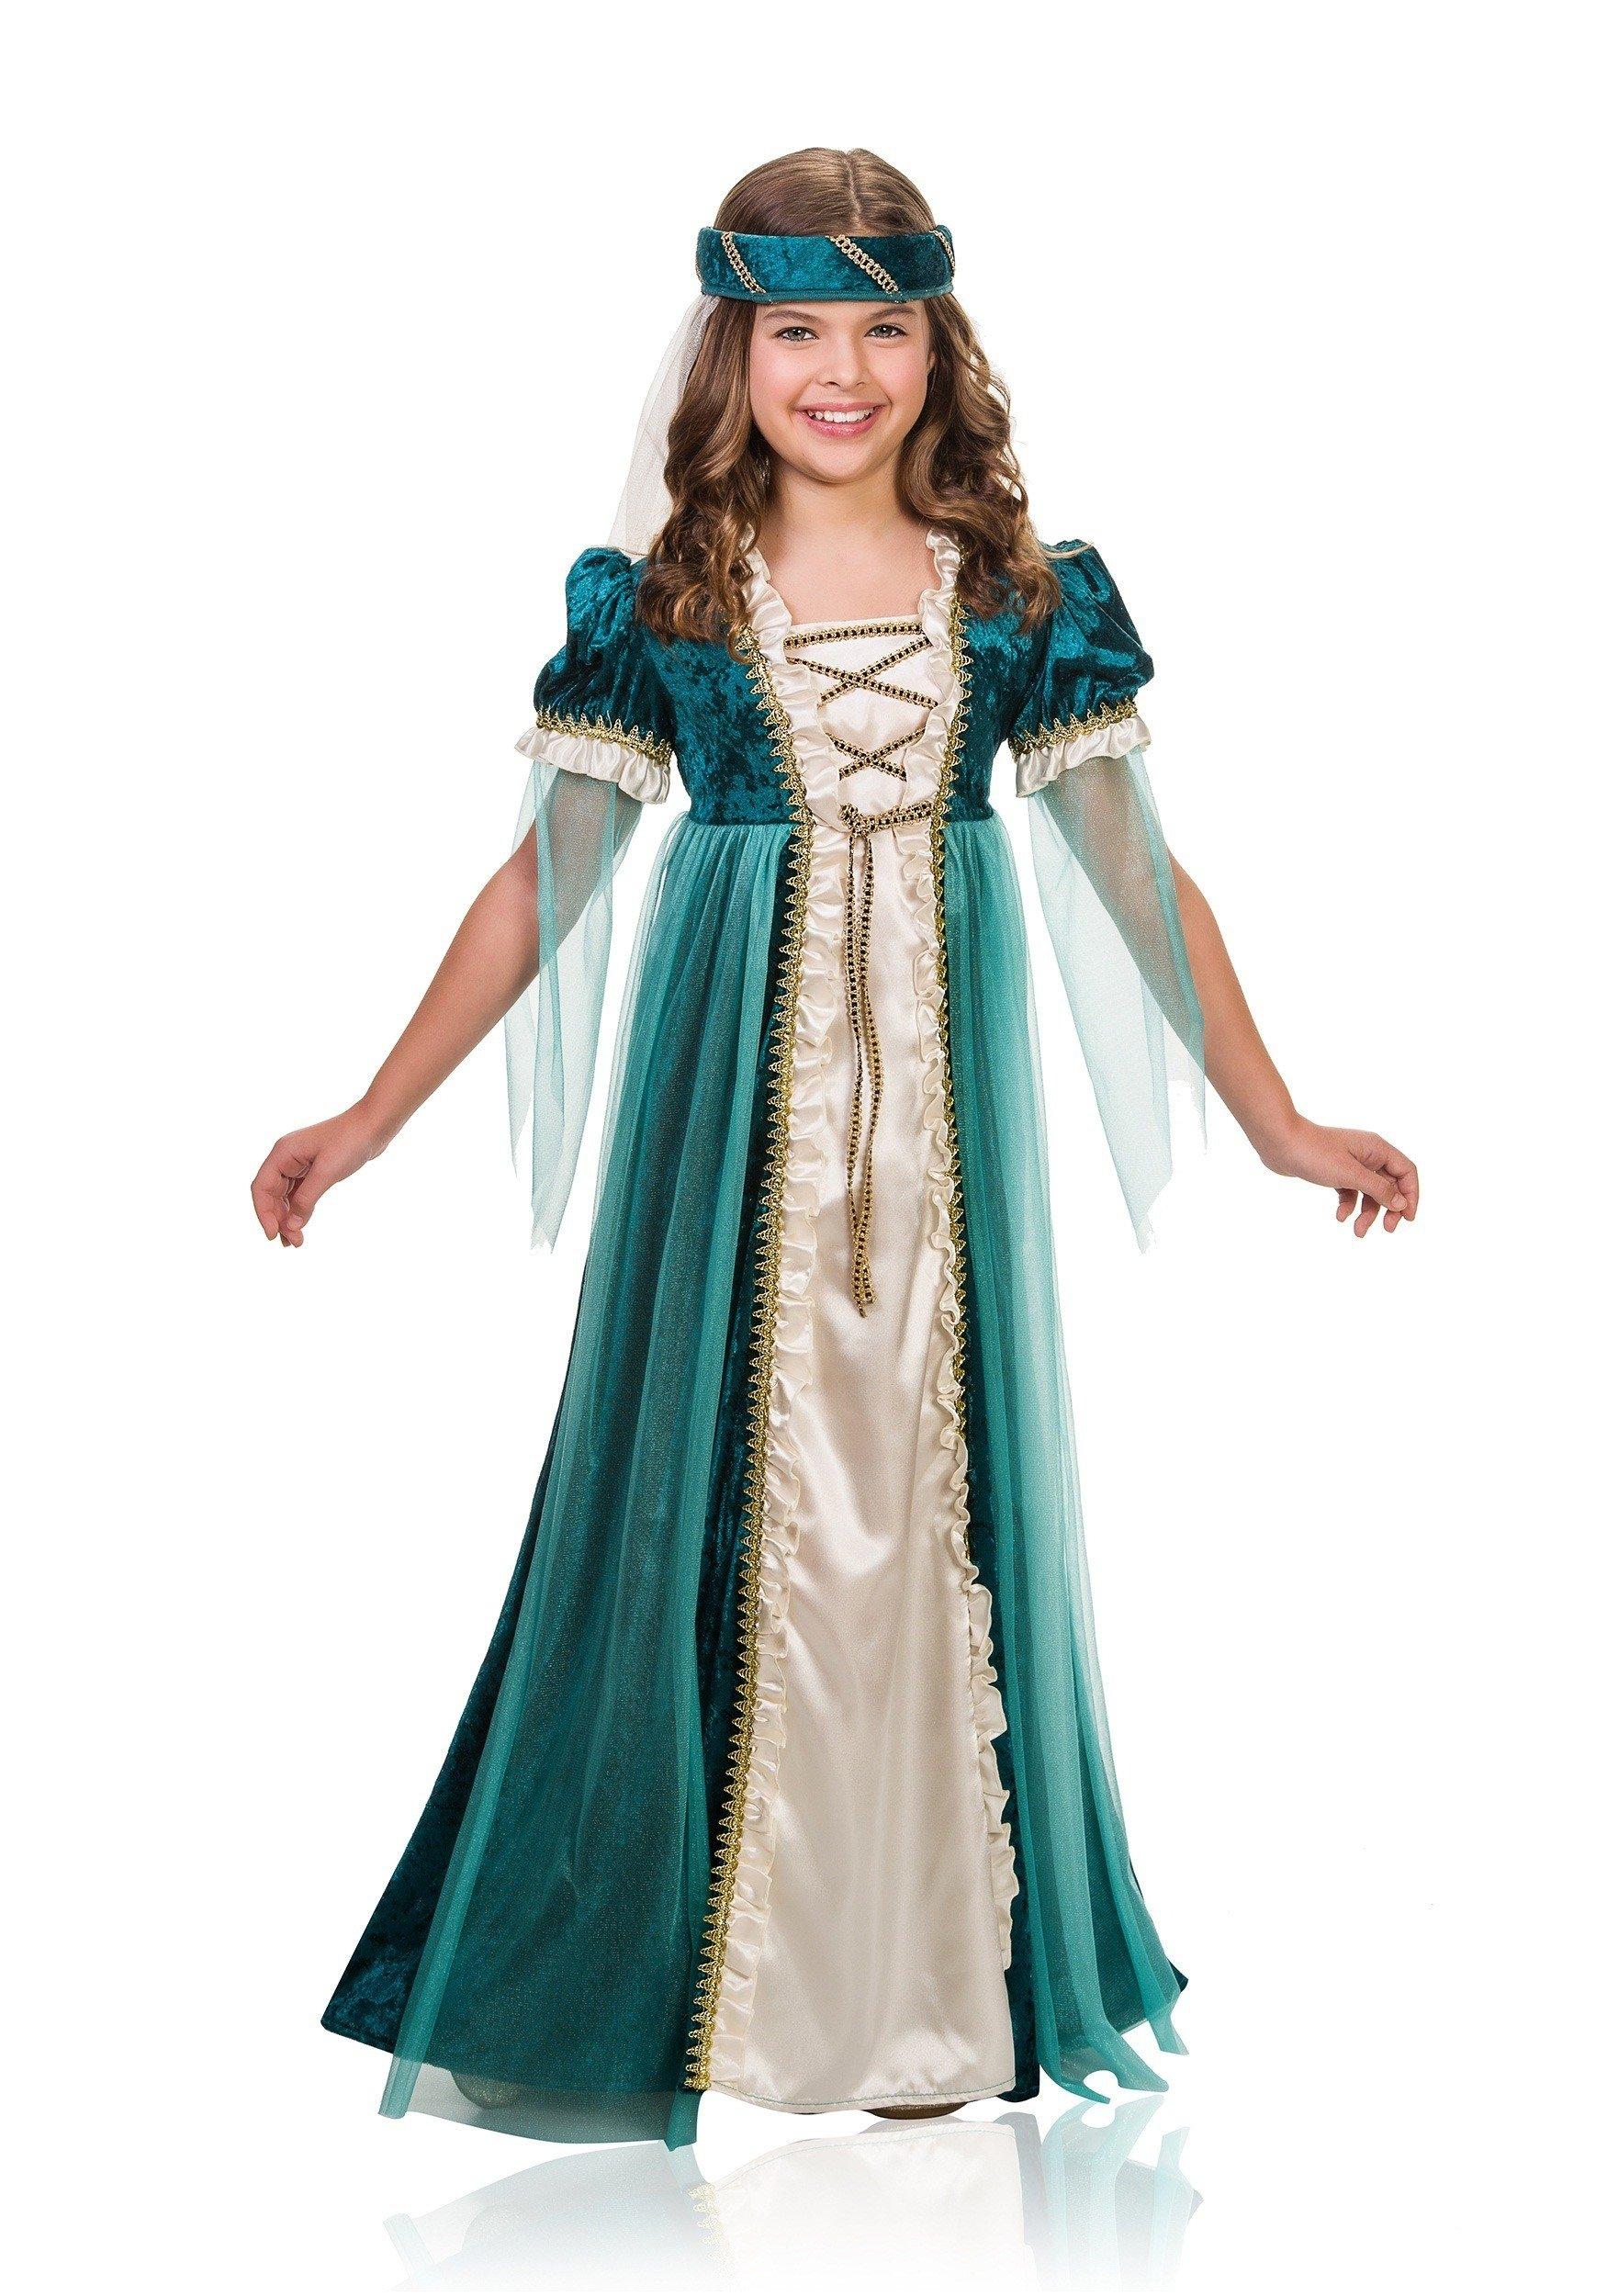 10 Fabulous Romeo And Juliet Costume Ideas childs lady juliet costume 2020